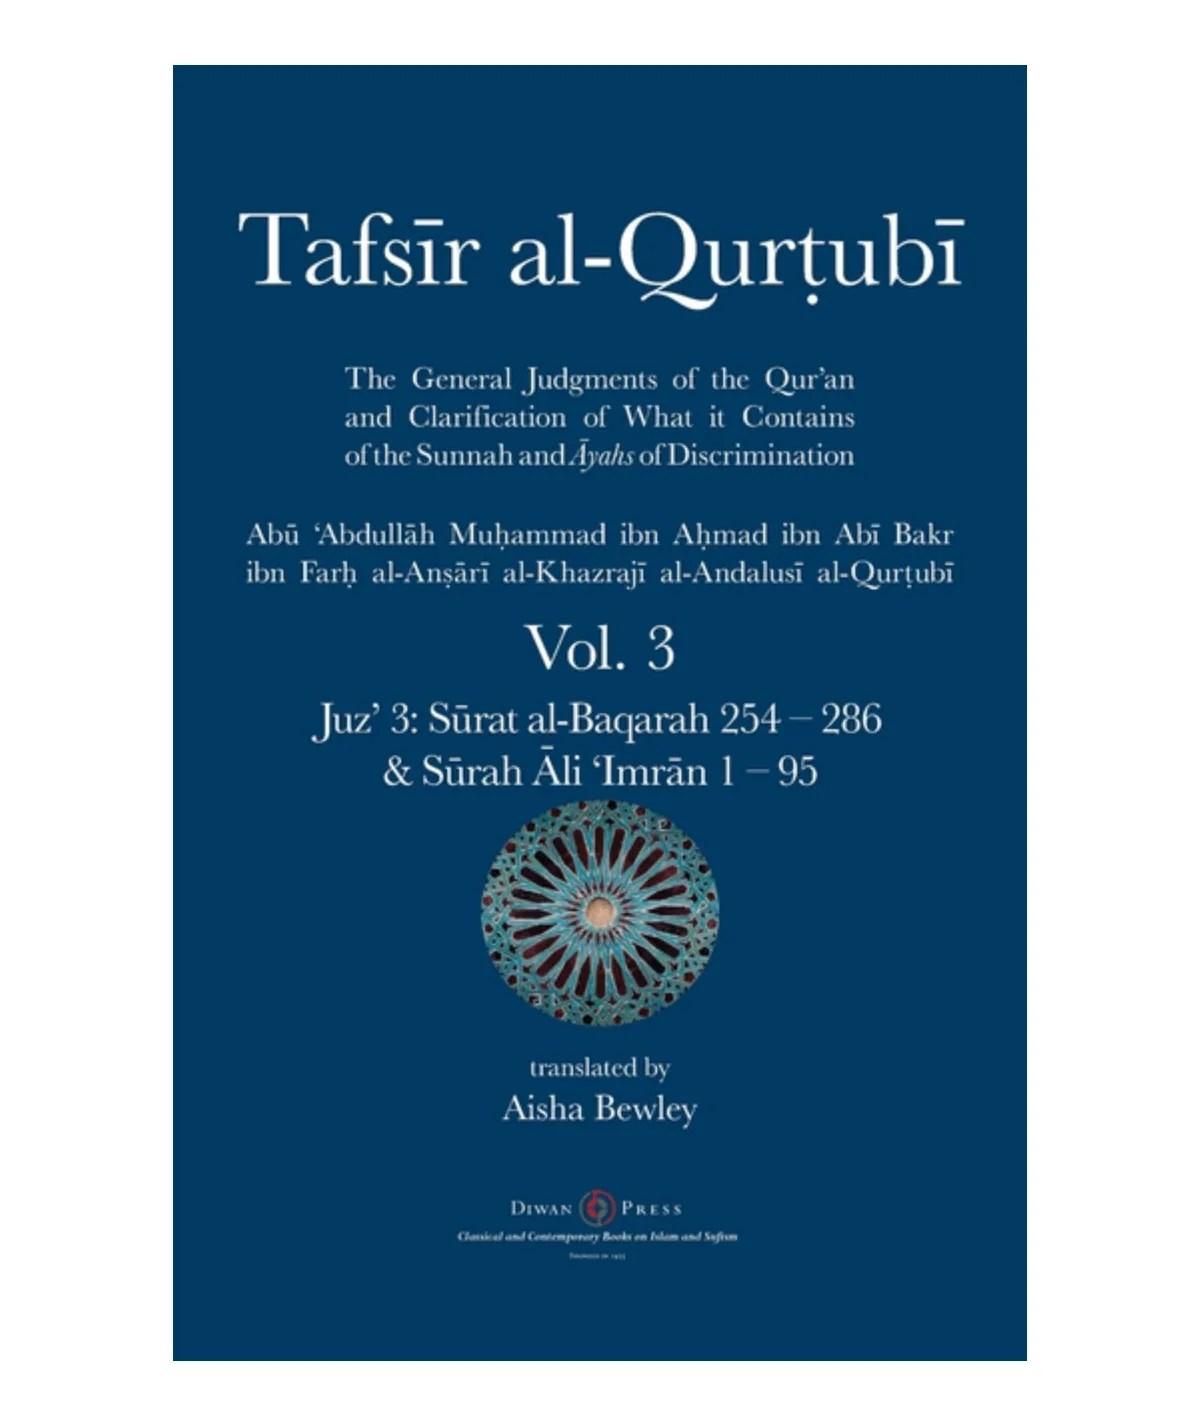 Tafsir al-Qurtubi Vol. 3: Juz' 3: Sūrat al-Baqarah 254 - 286 & Sūrah Āli 'Imrān 1 - 95: Al-Qurtubi, Abu 'abdullah Muhammad | Bewley, Aisha Abdurrahman | Bewley, Abdalhaqq